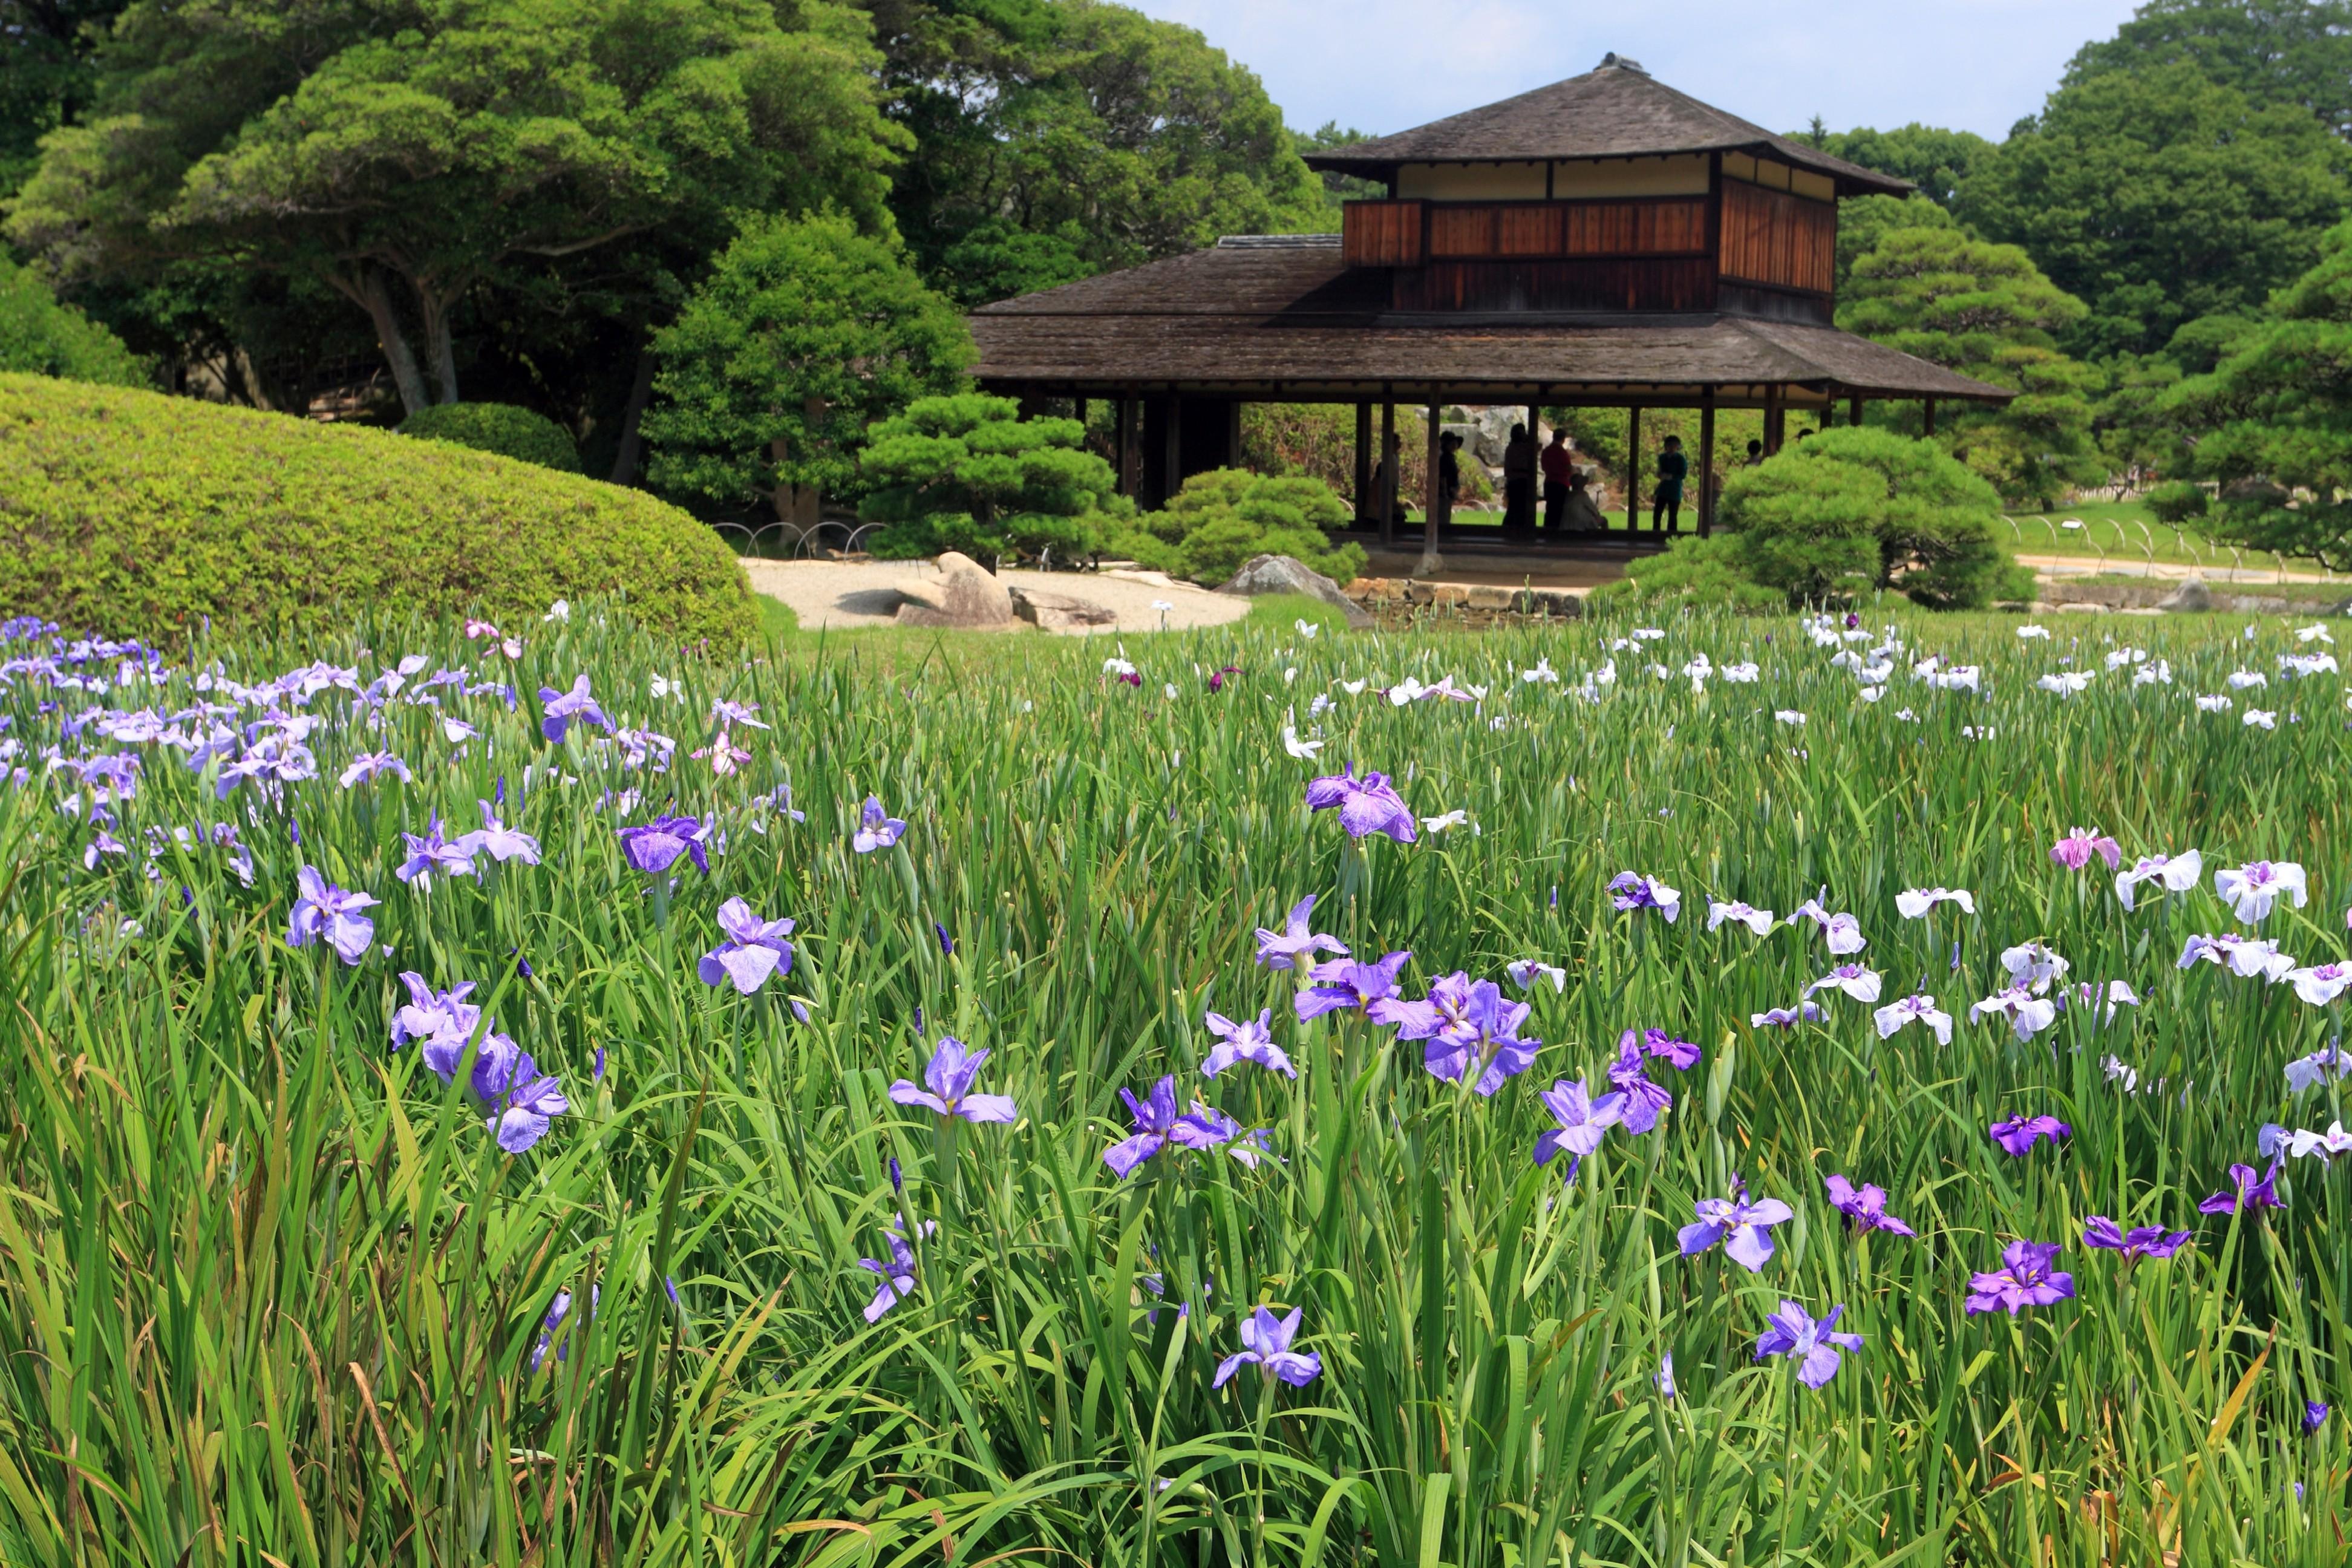 Irises in the japanes garden